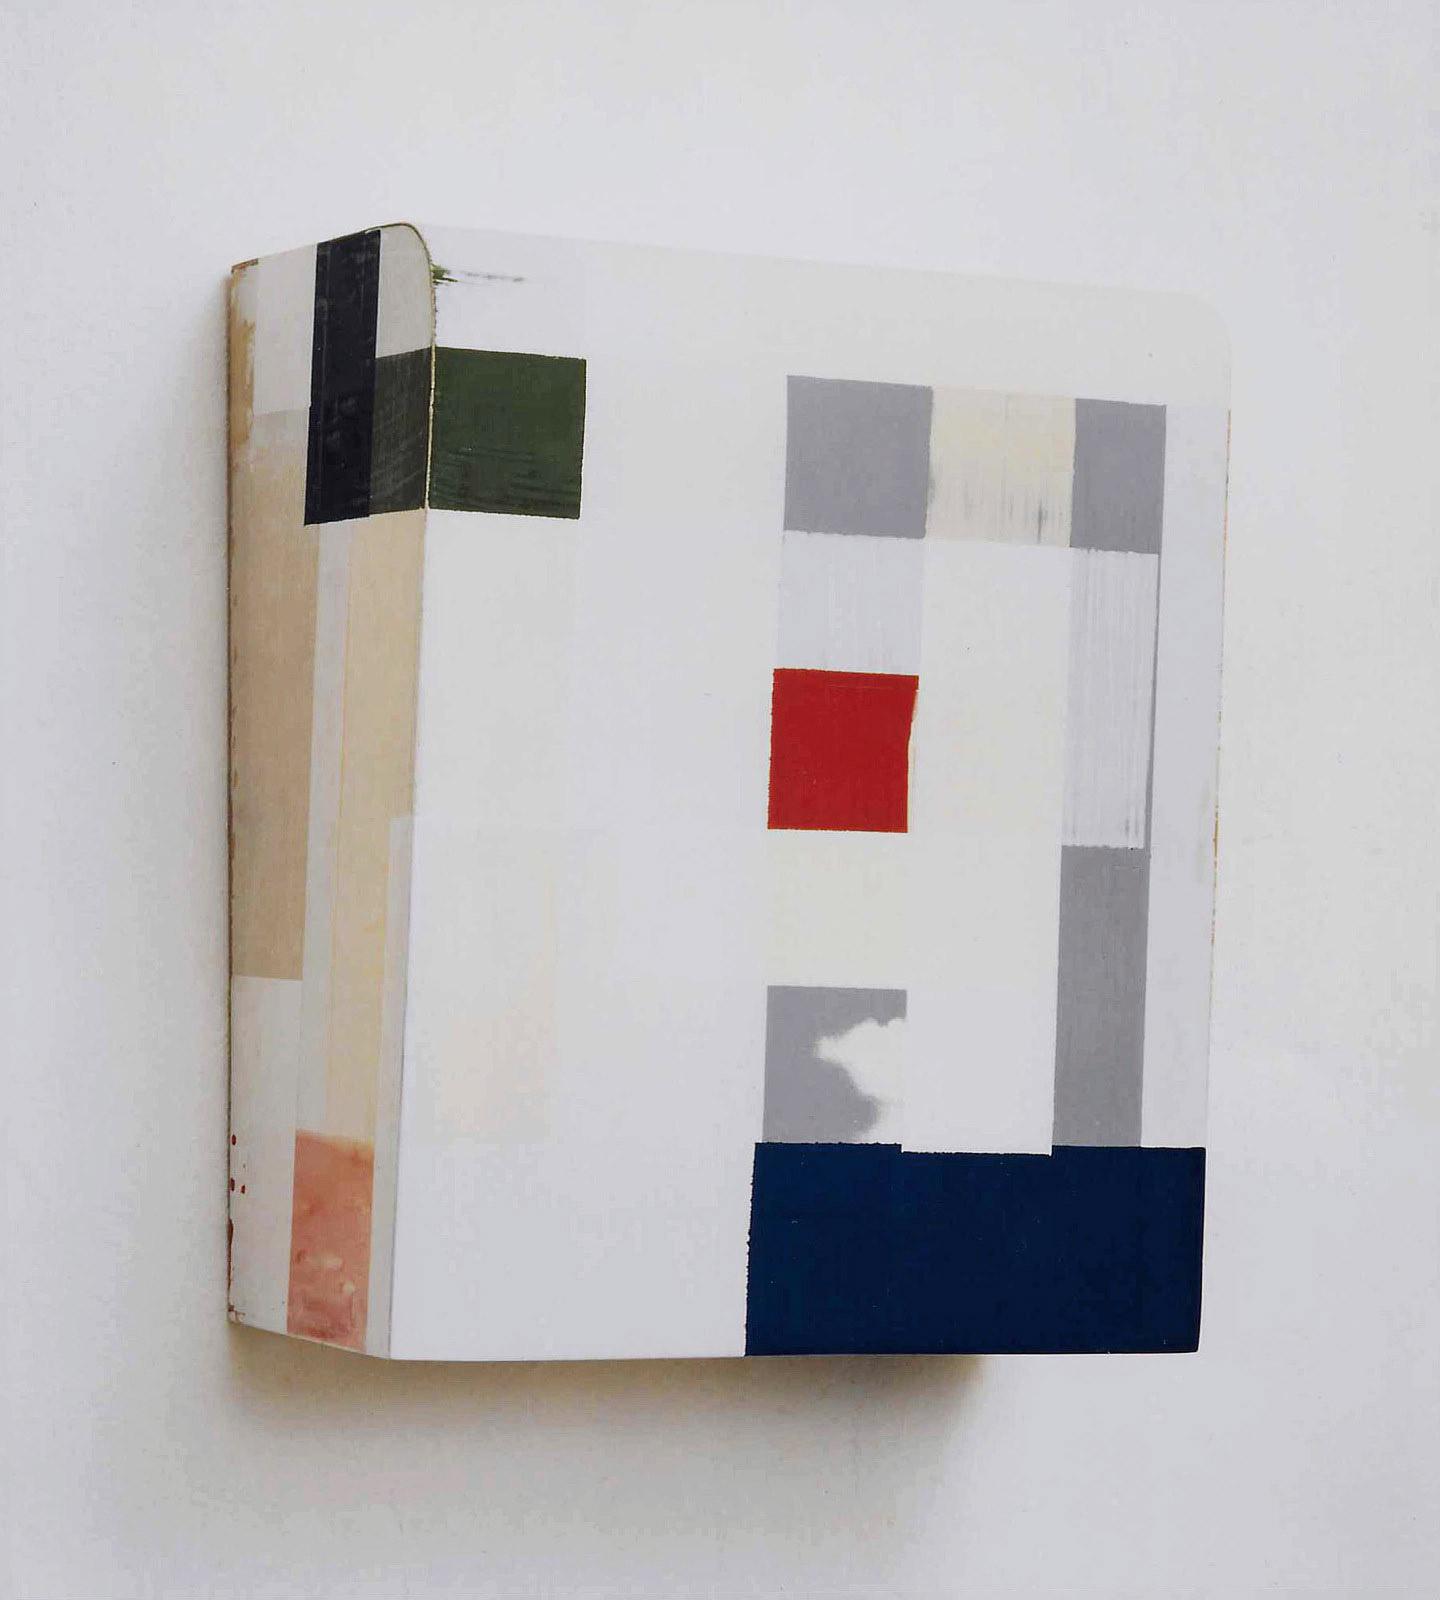 """Kunst ist kostbar II"", 43x33x21 cm, Acrylfarbe, Holz, 1994"